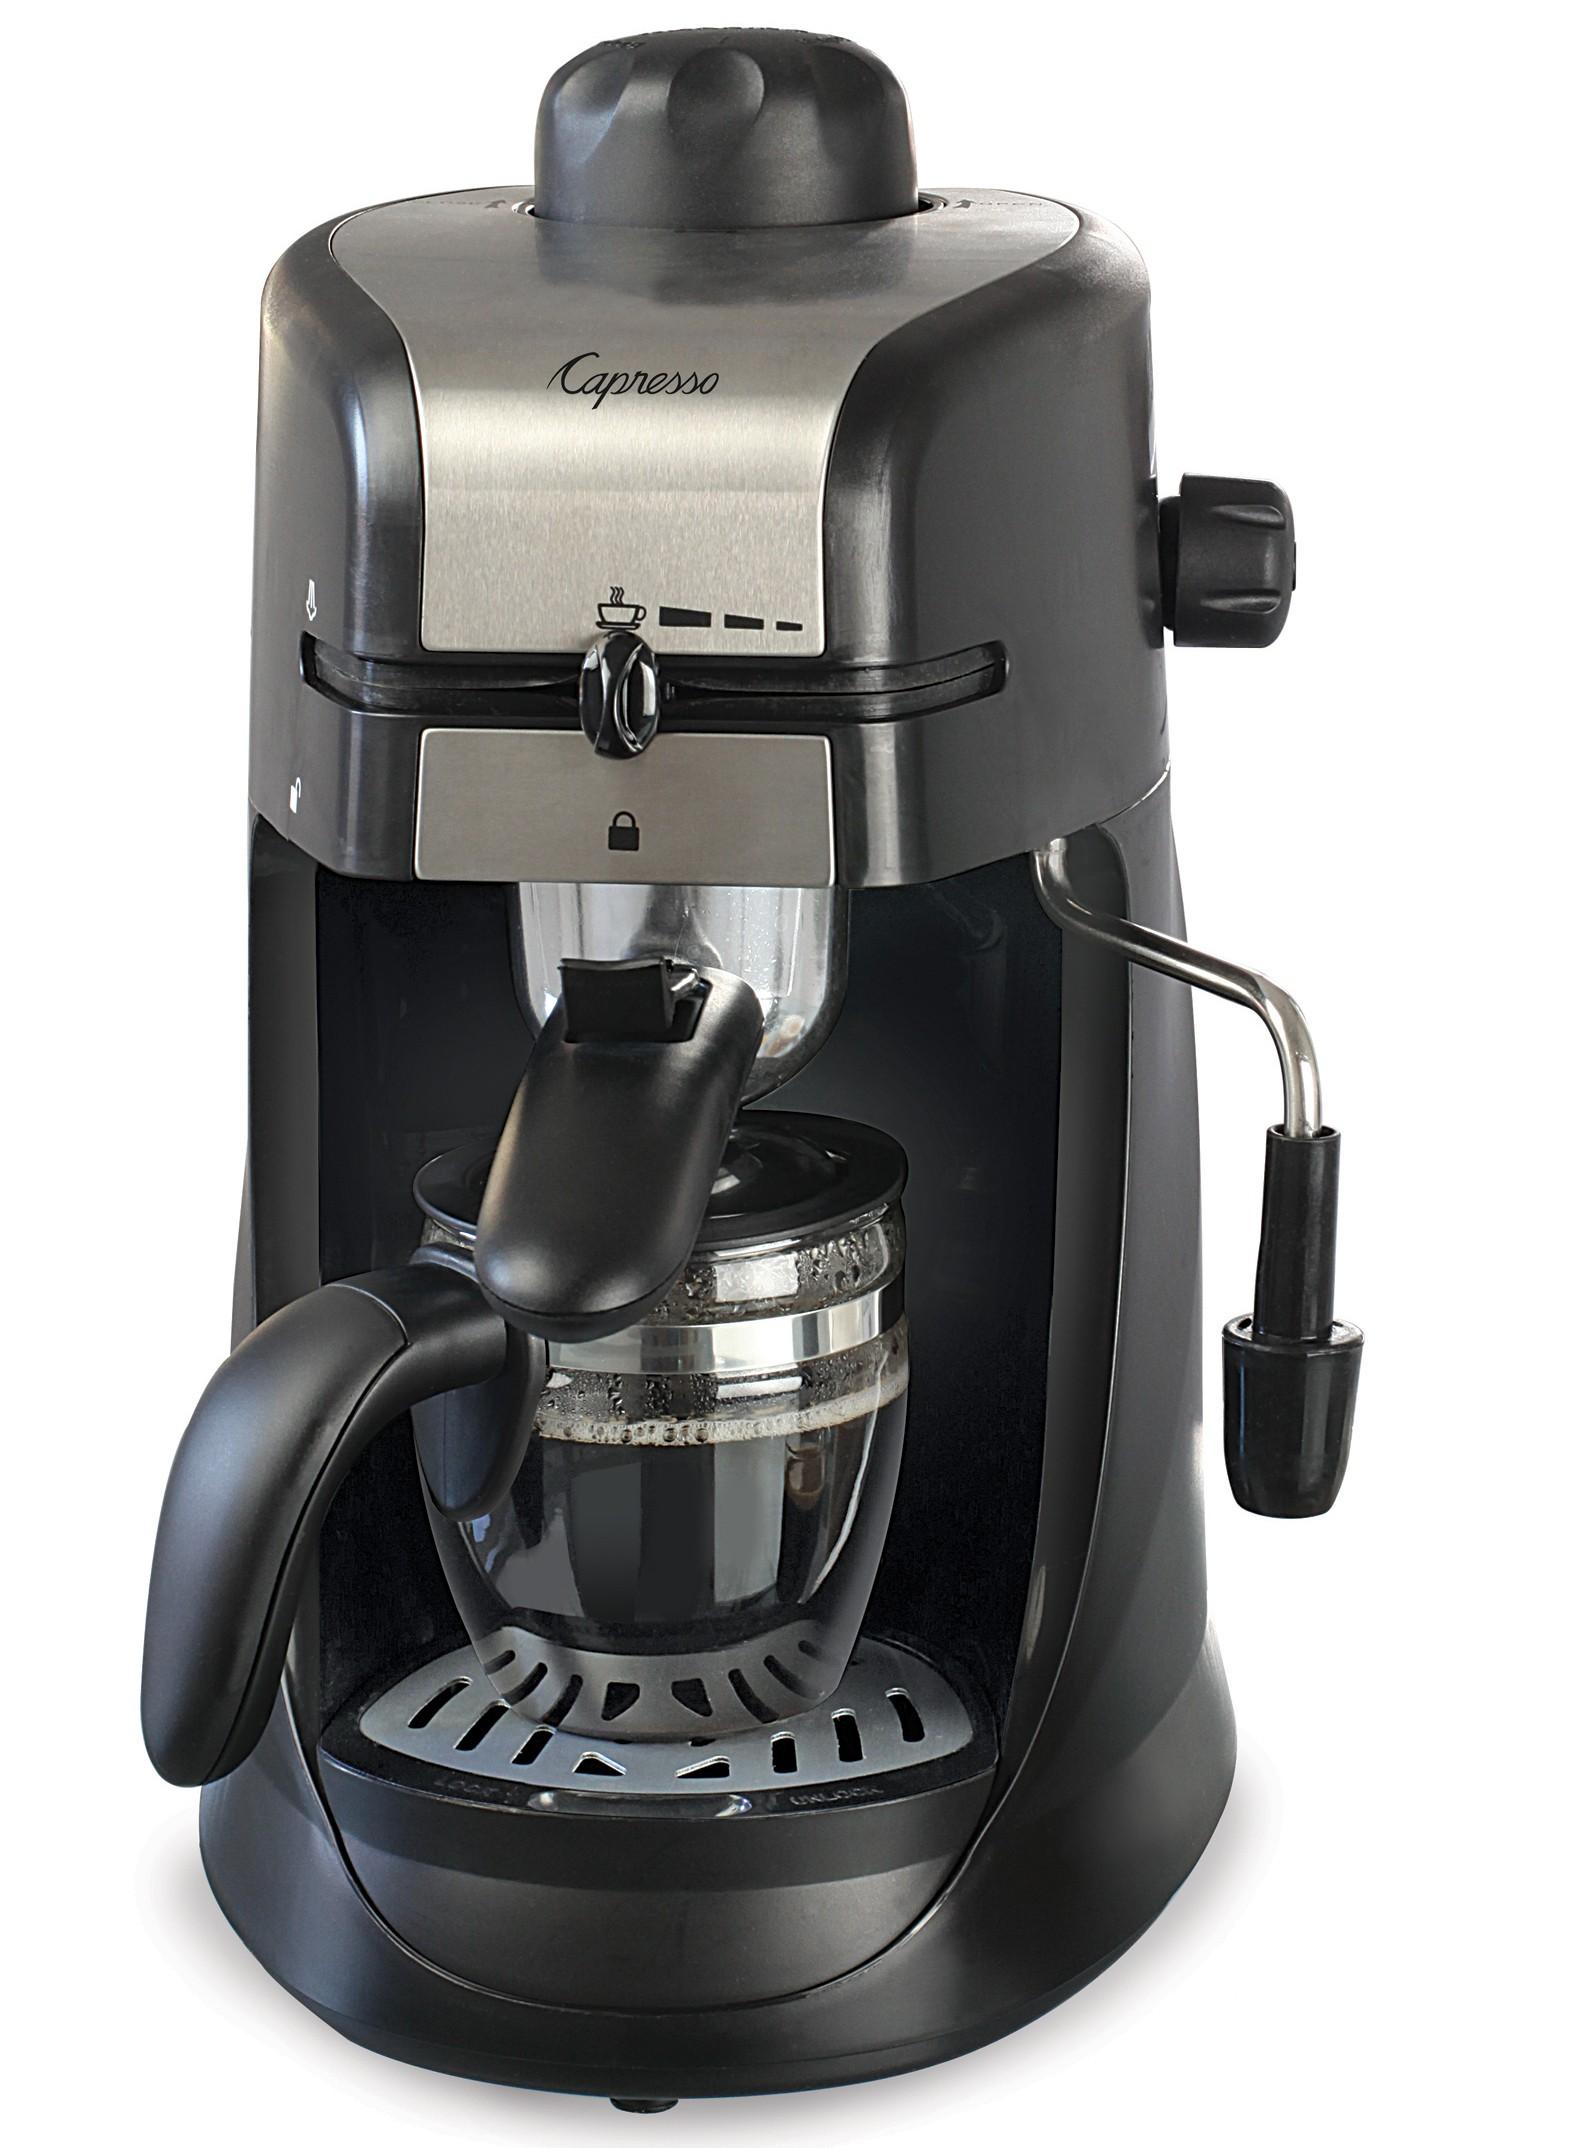 Capresso Steam Pro 4 Cup Coffee Machine | Creative Cookware